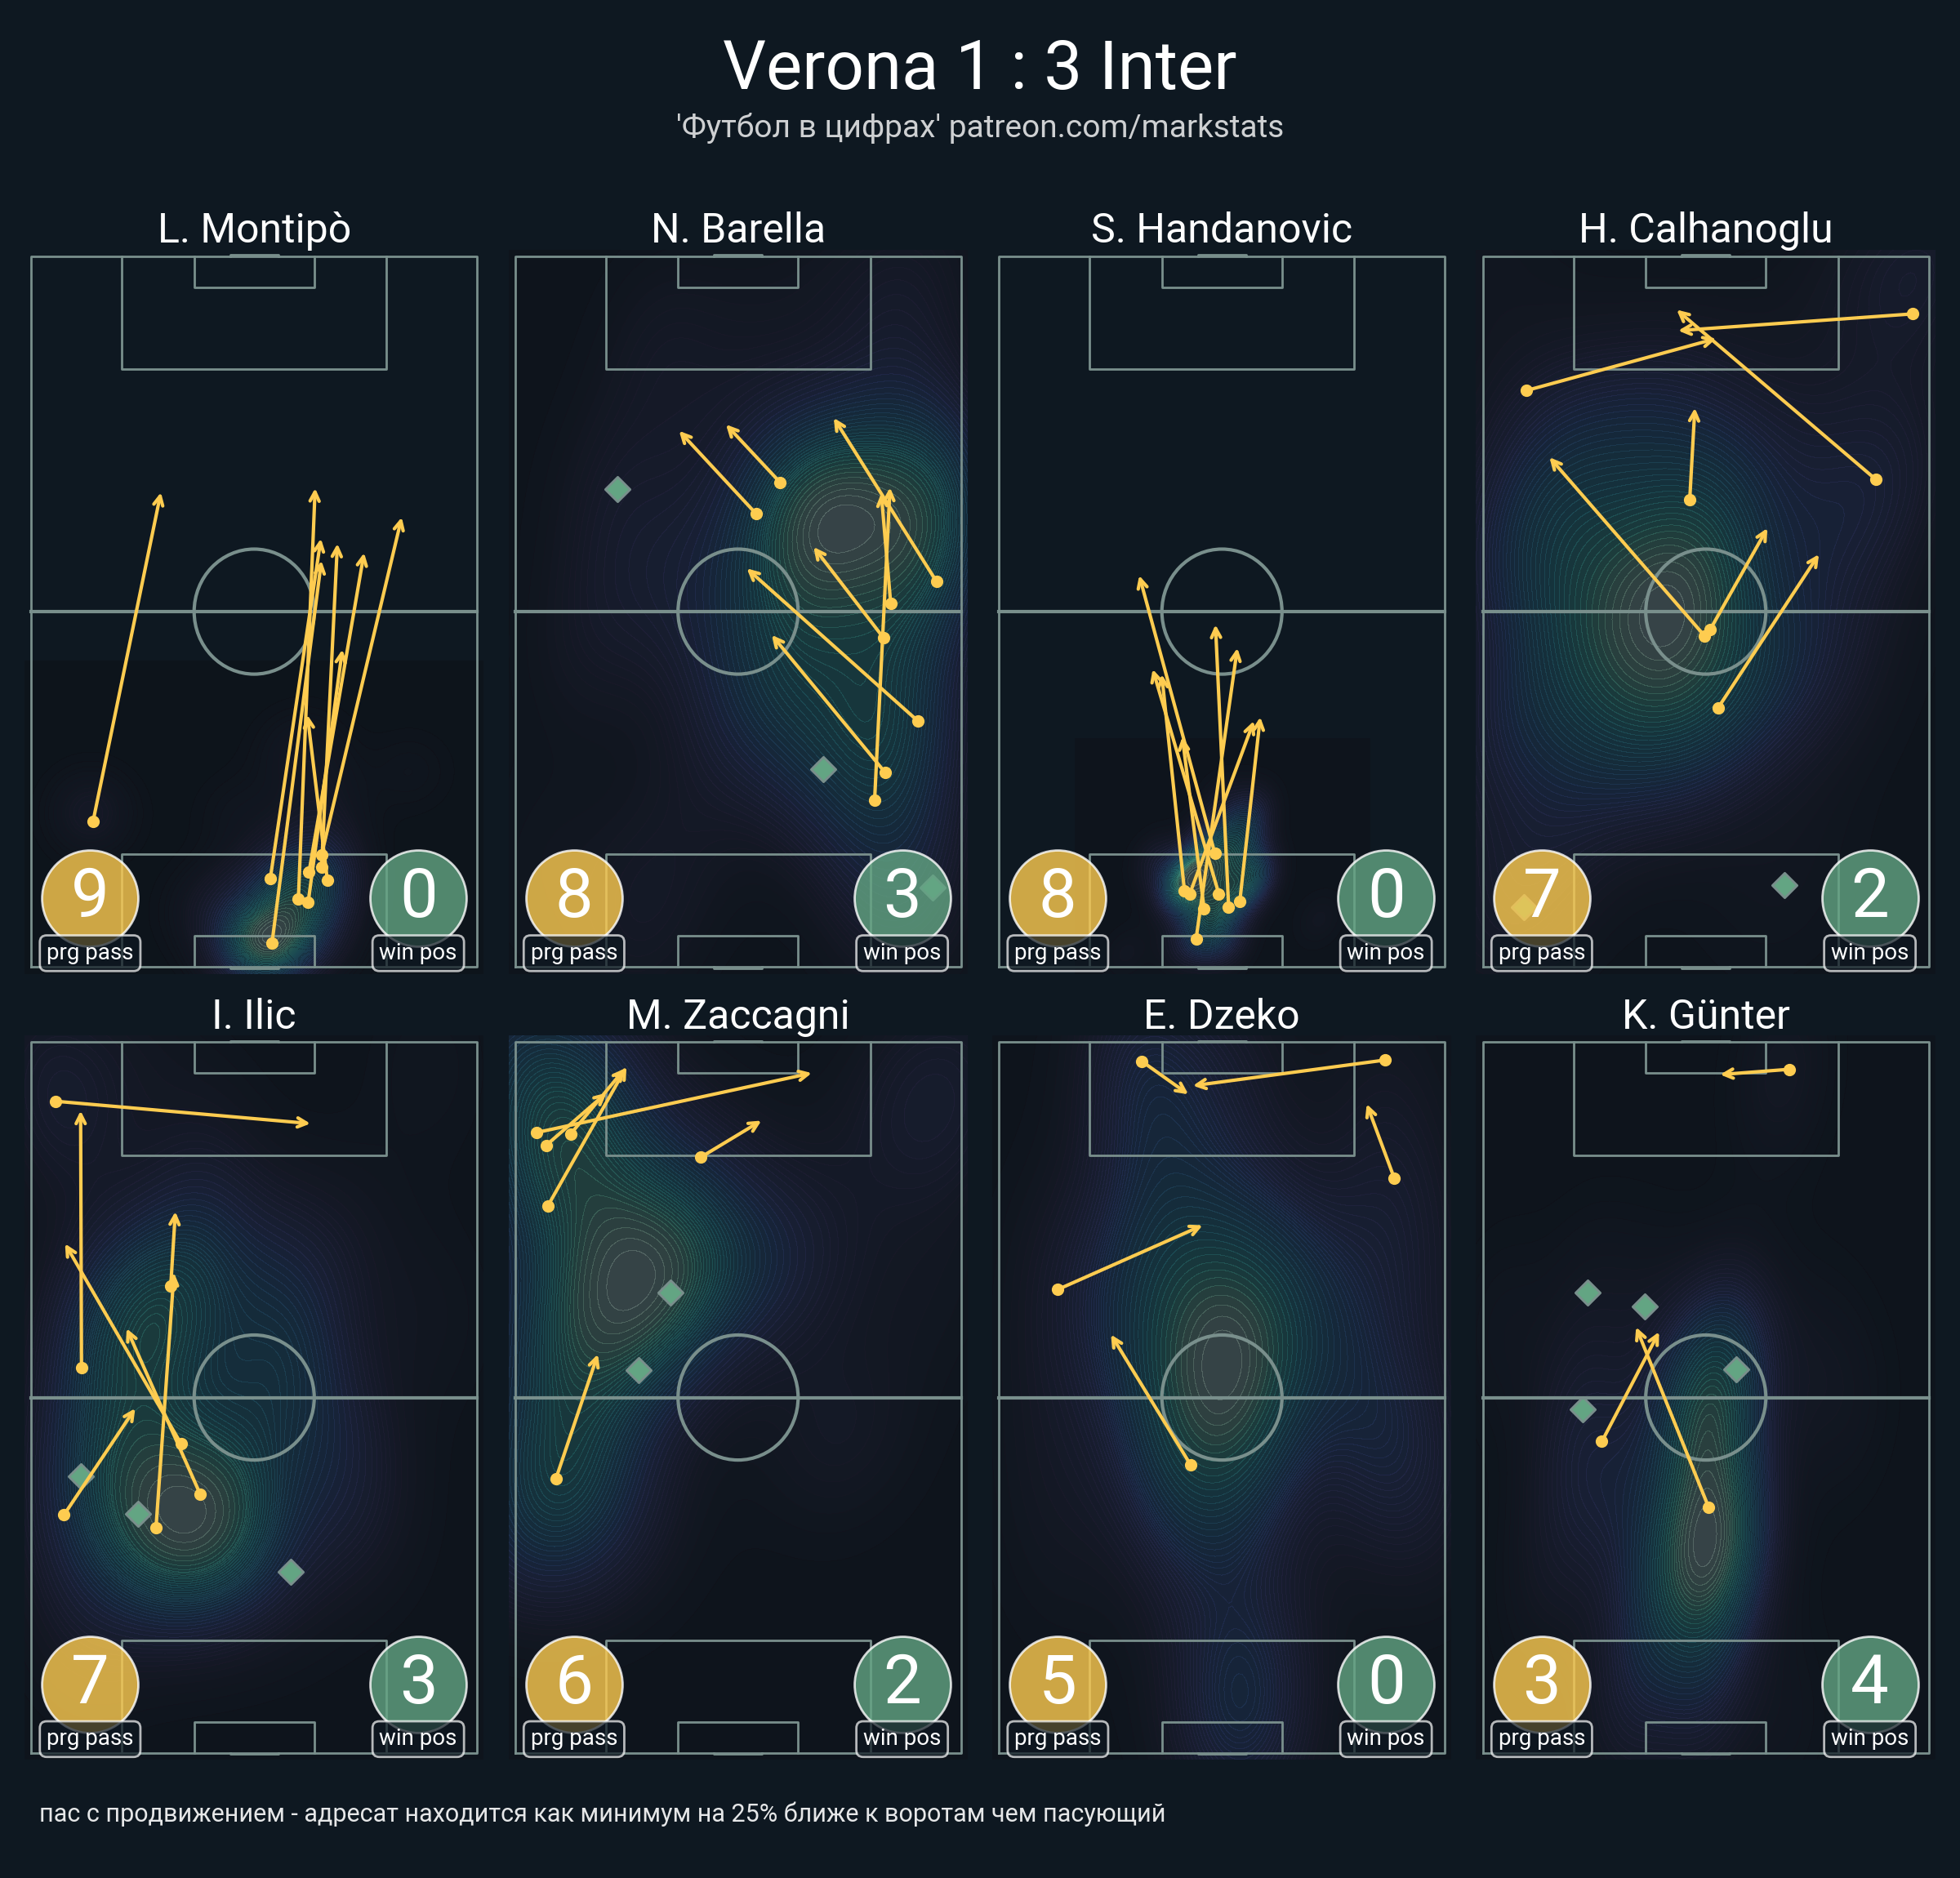 Начало сезона: Интер